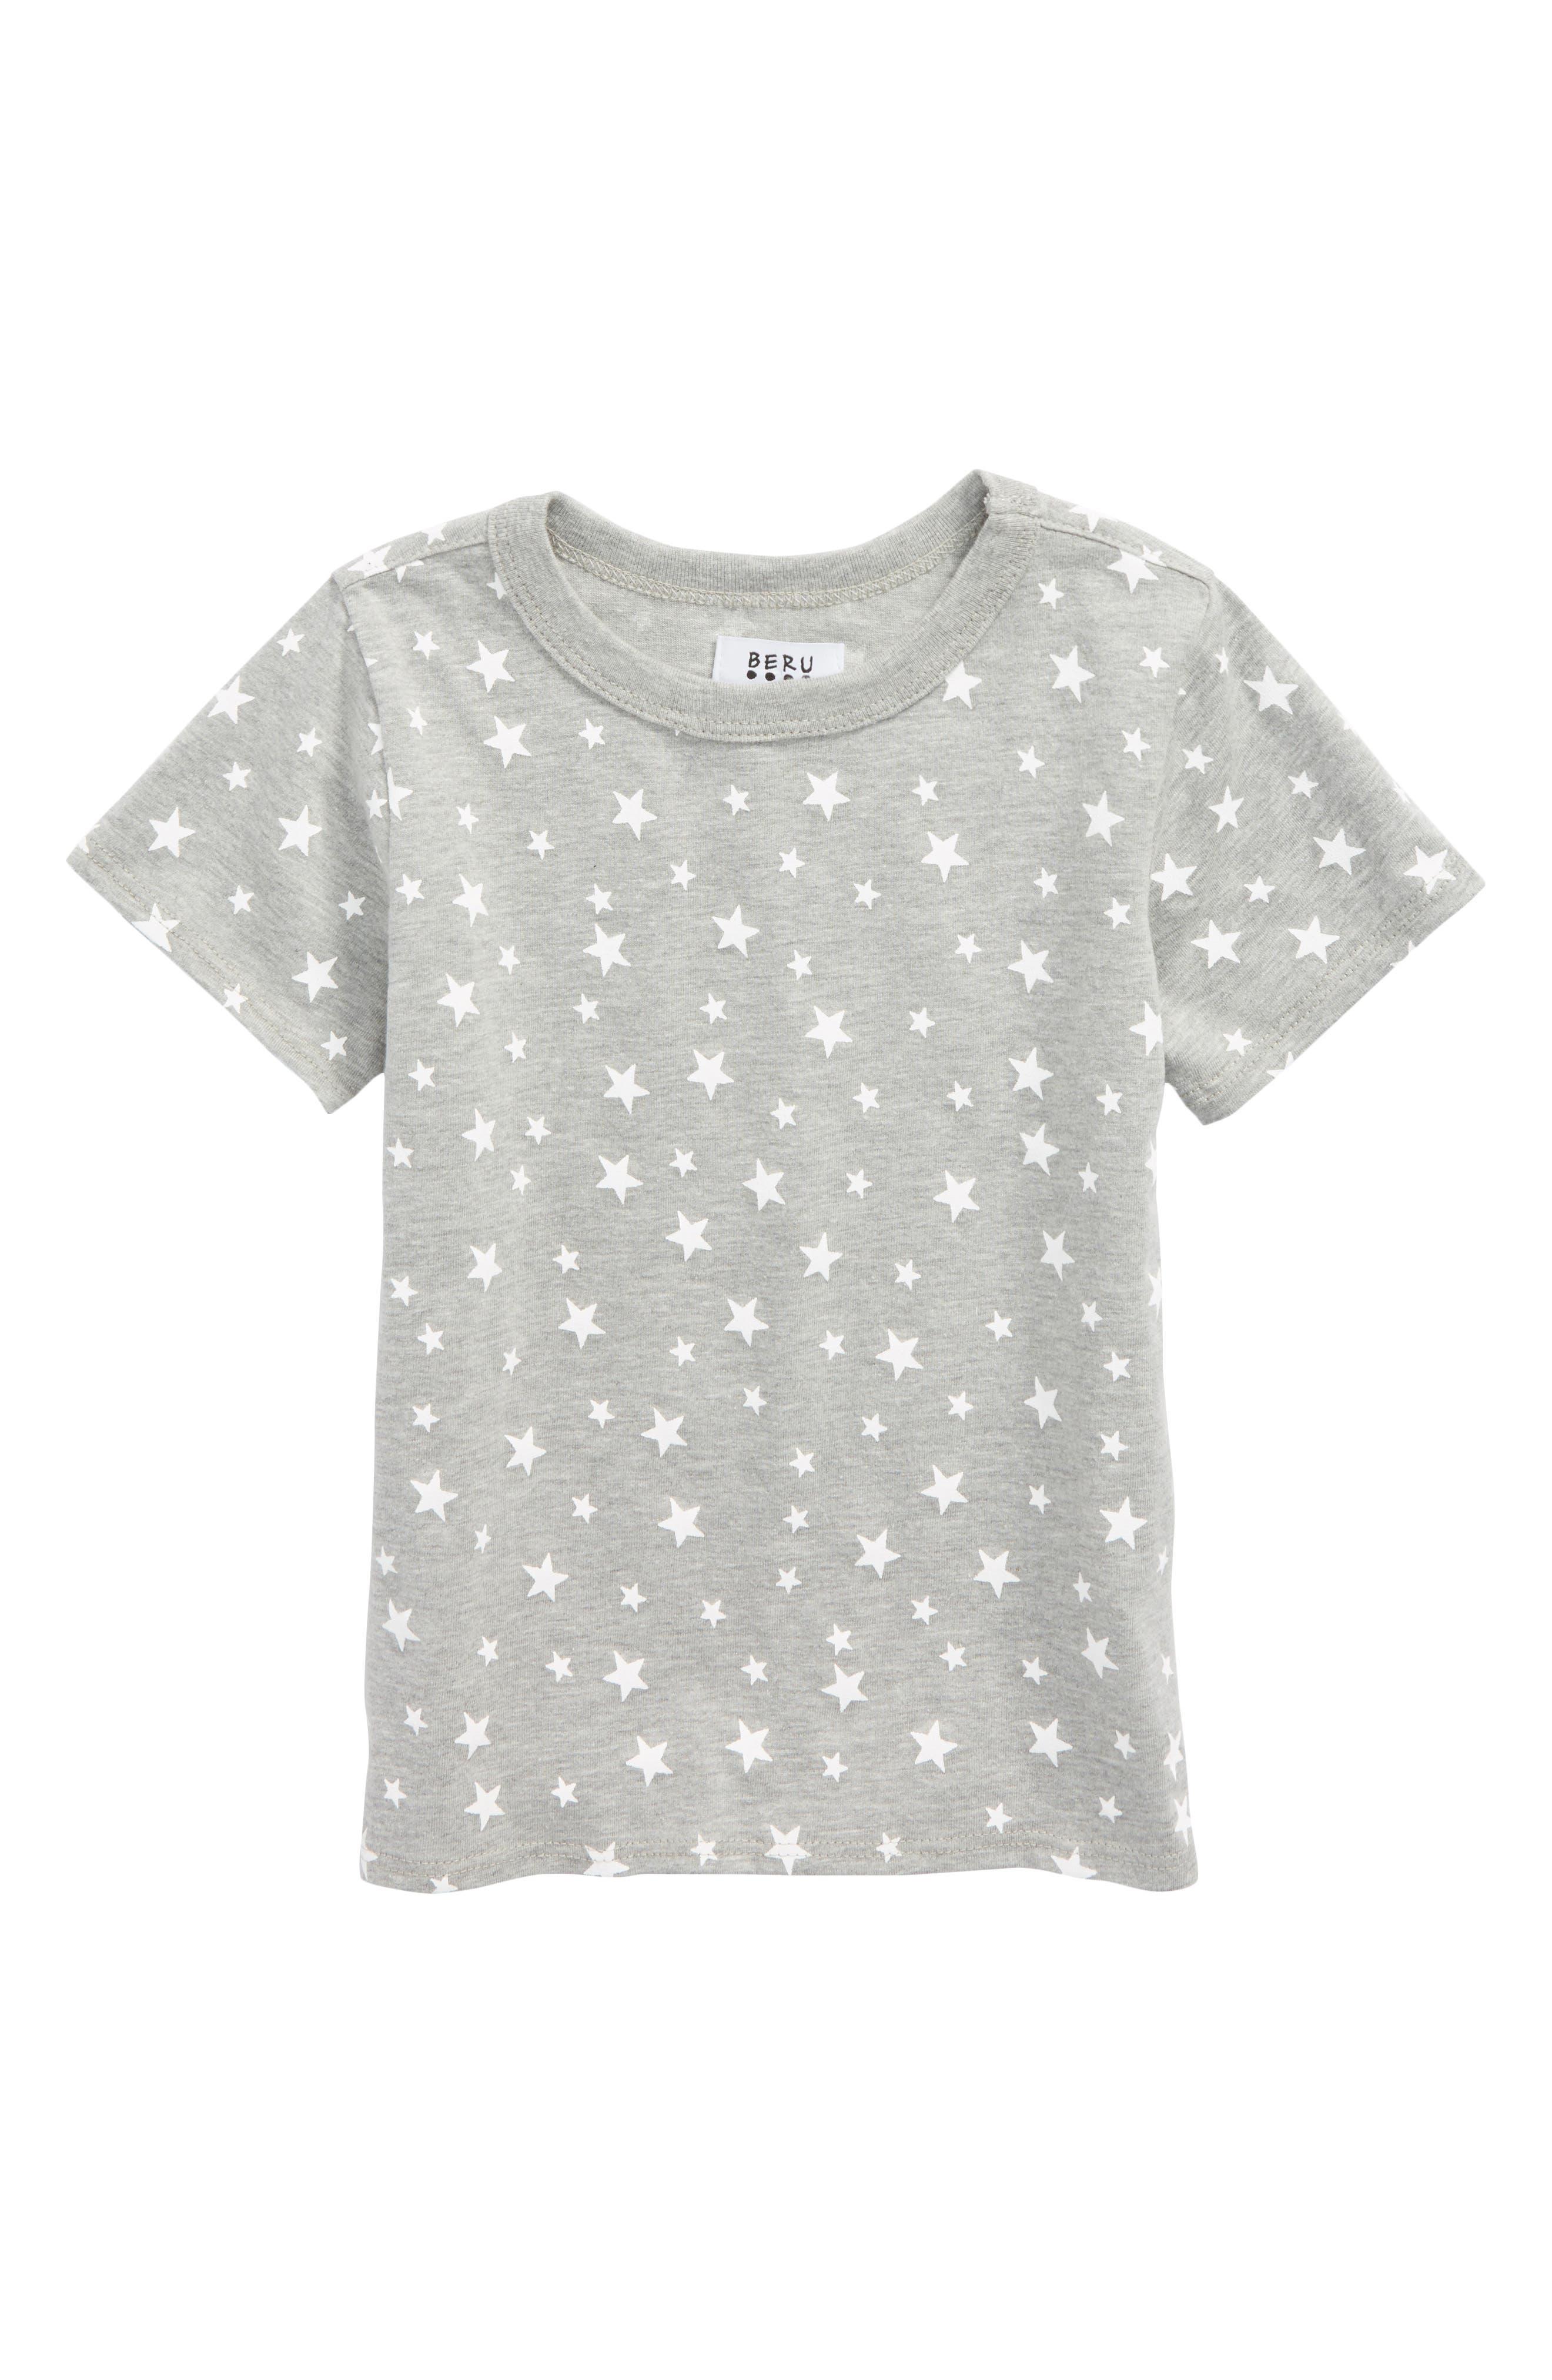 Main Image - Beru Enzo Star Print T-Shirt (Toddler Boys & Little Boys)